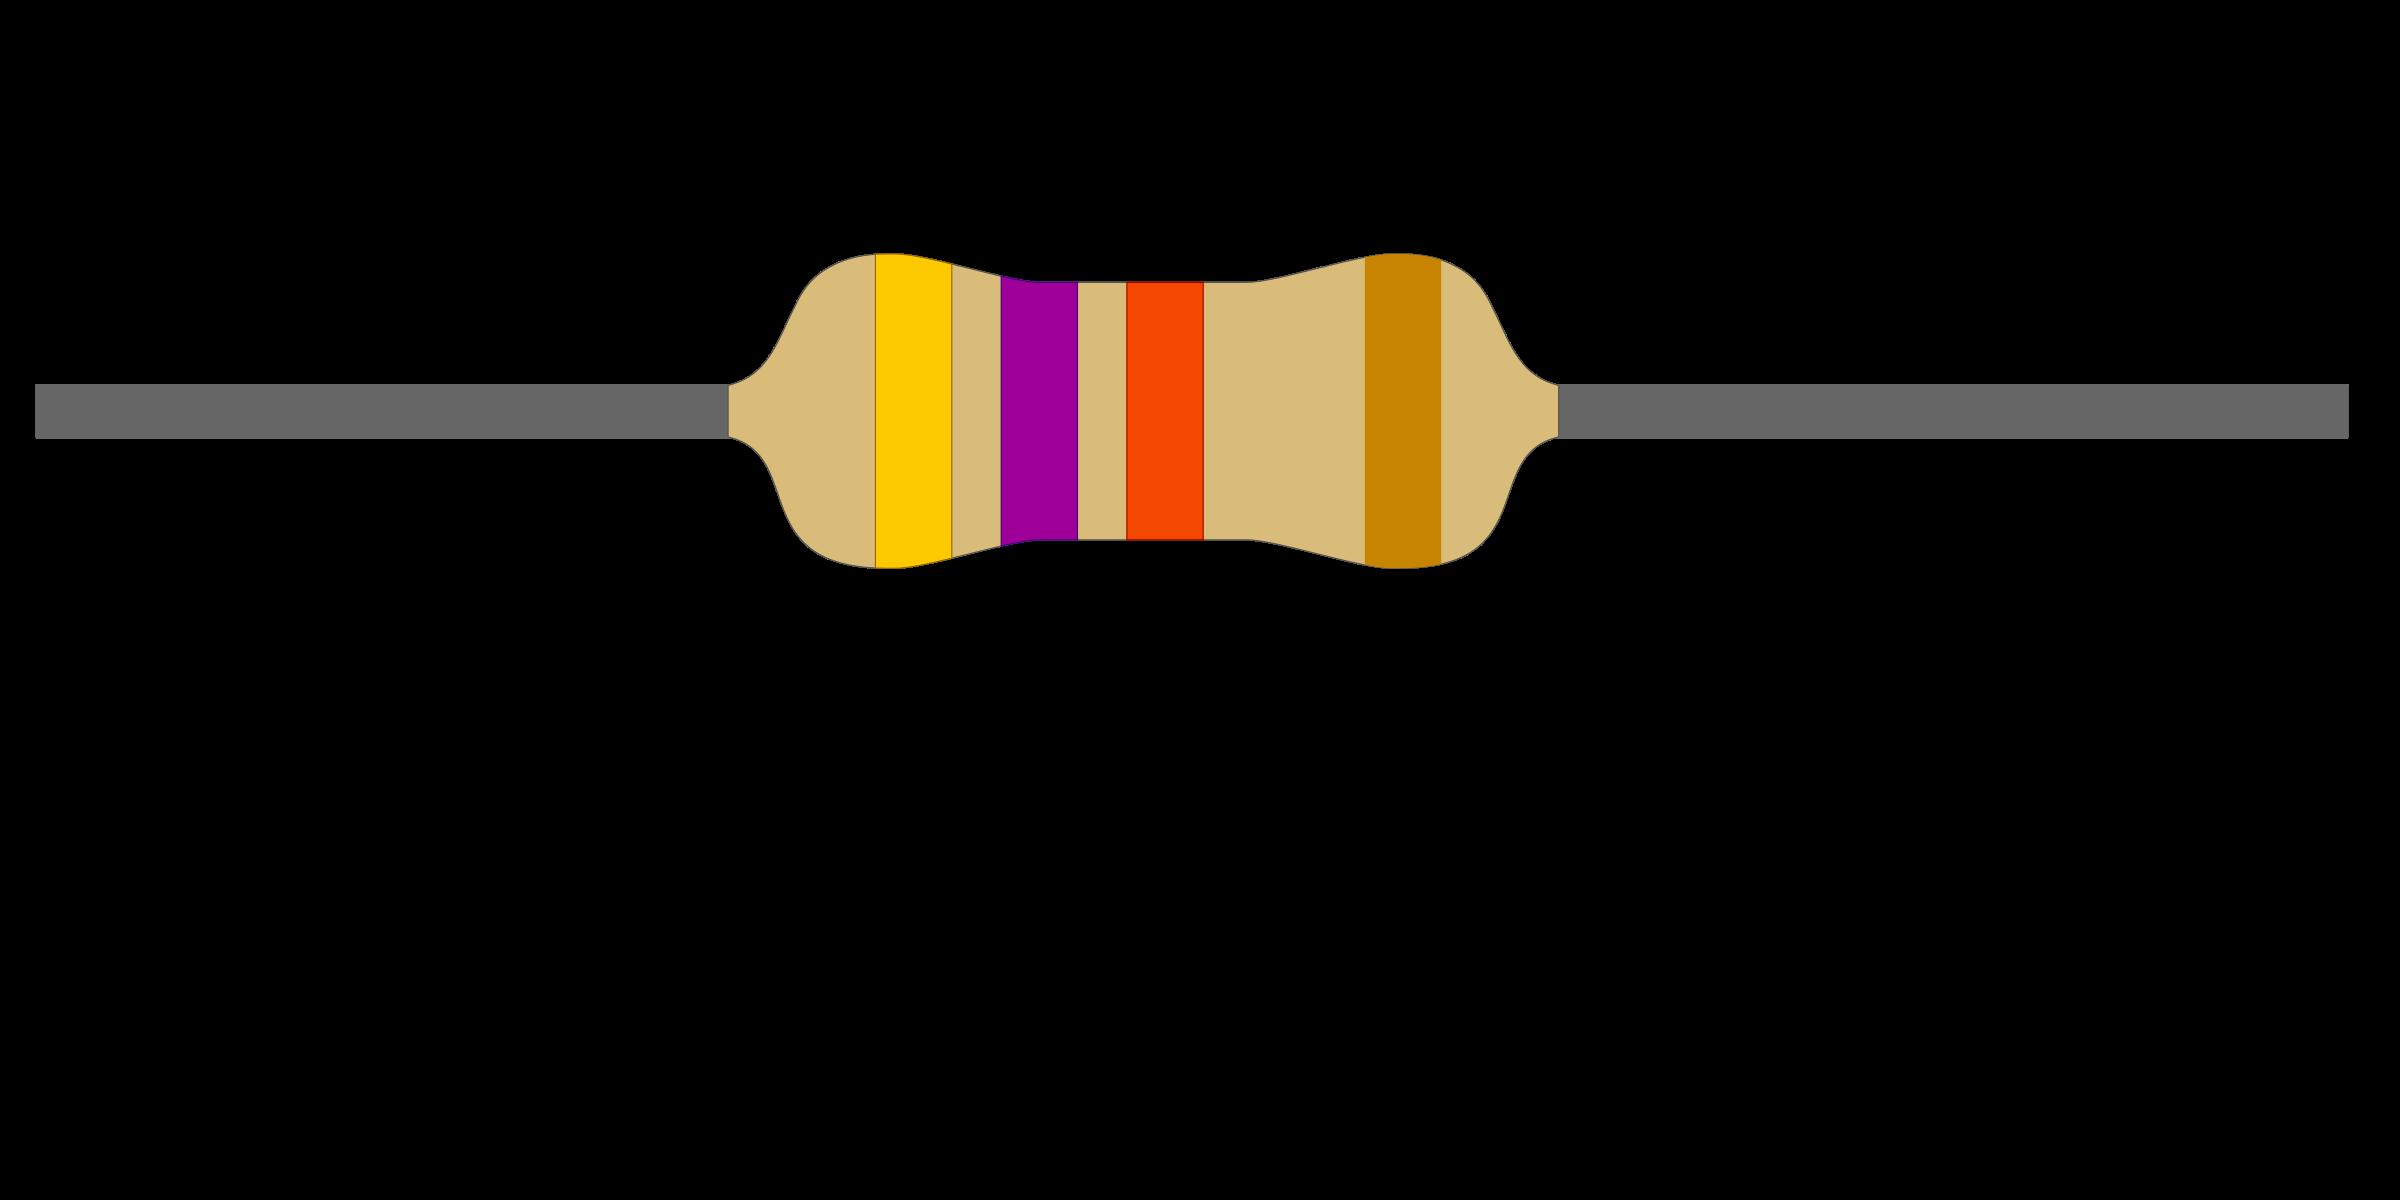 K ohm big image. Electronics clipart resistor